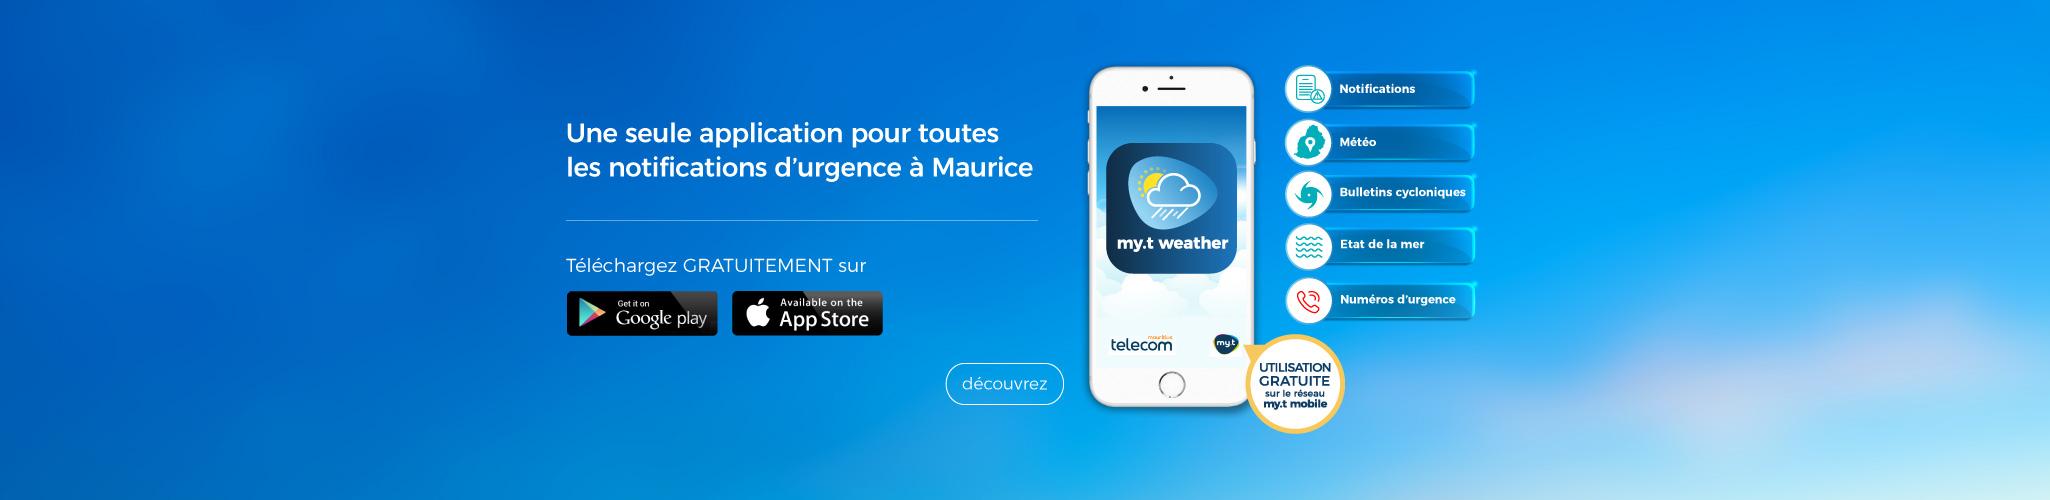 my.t Weather app